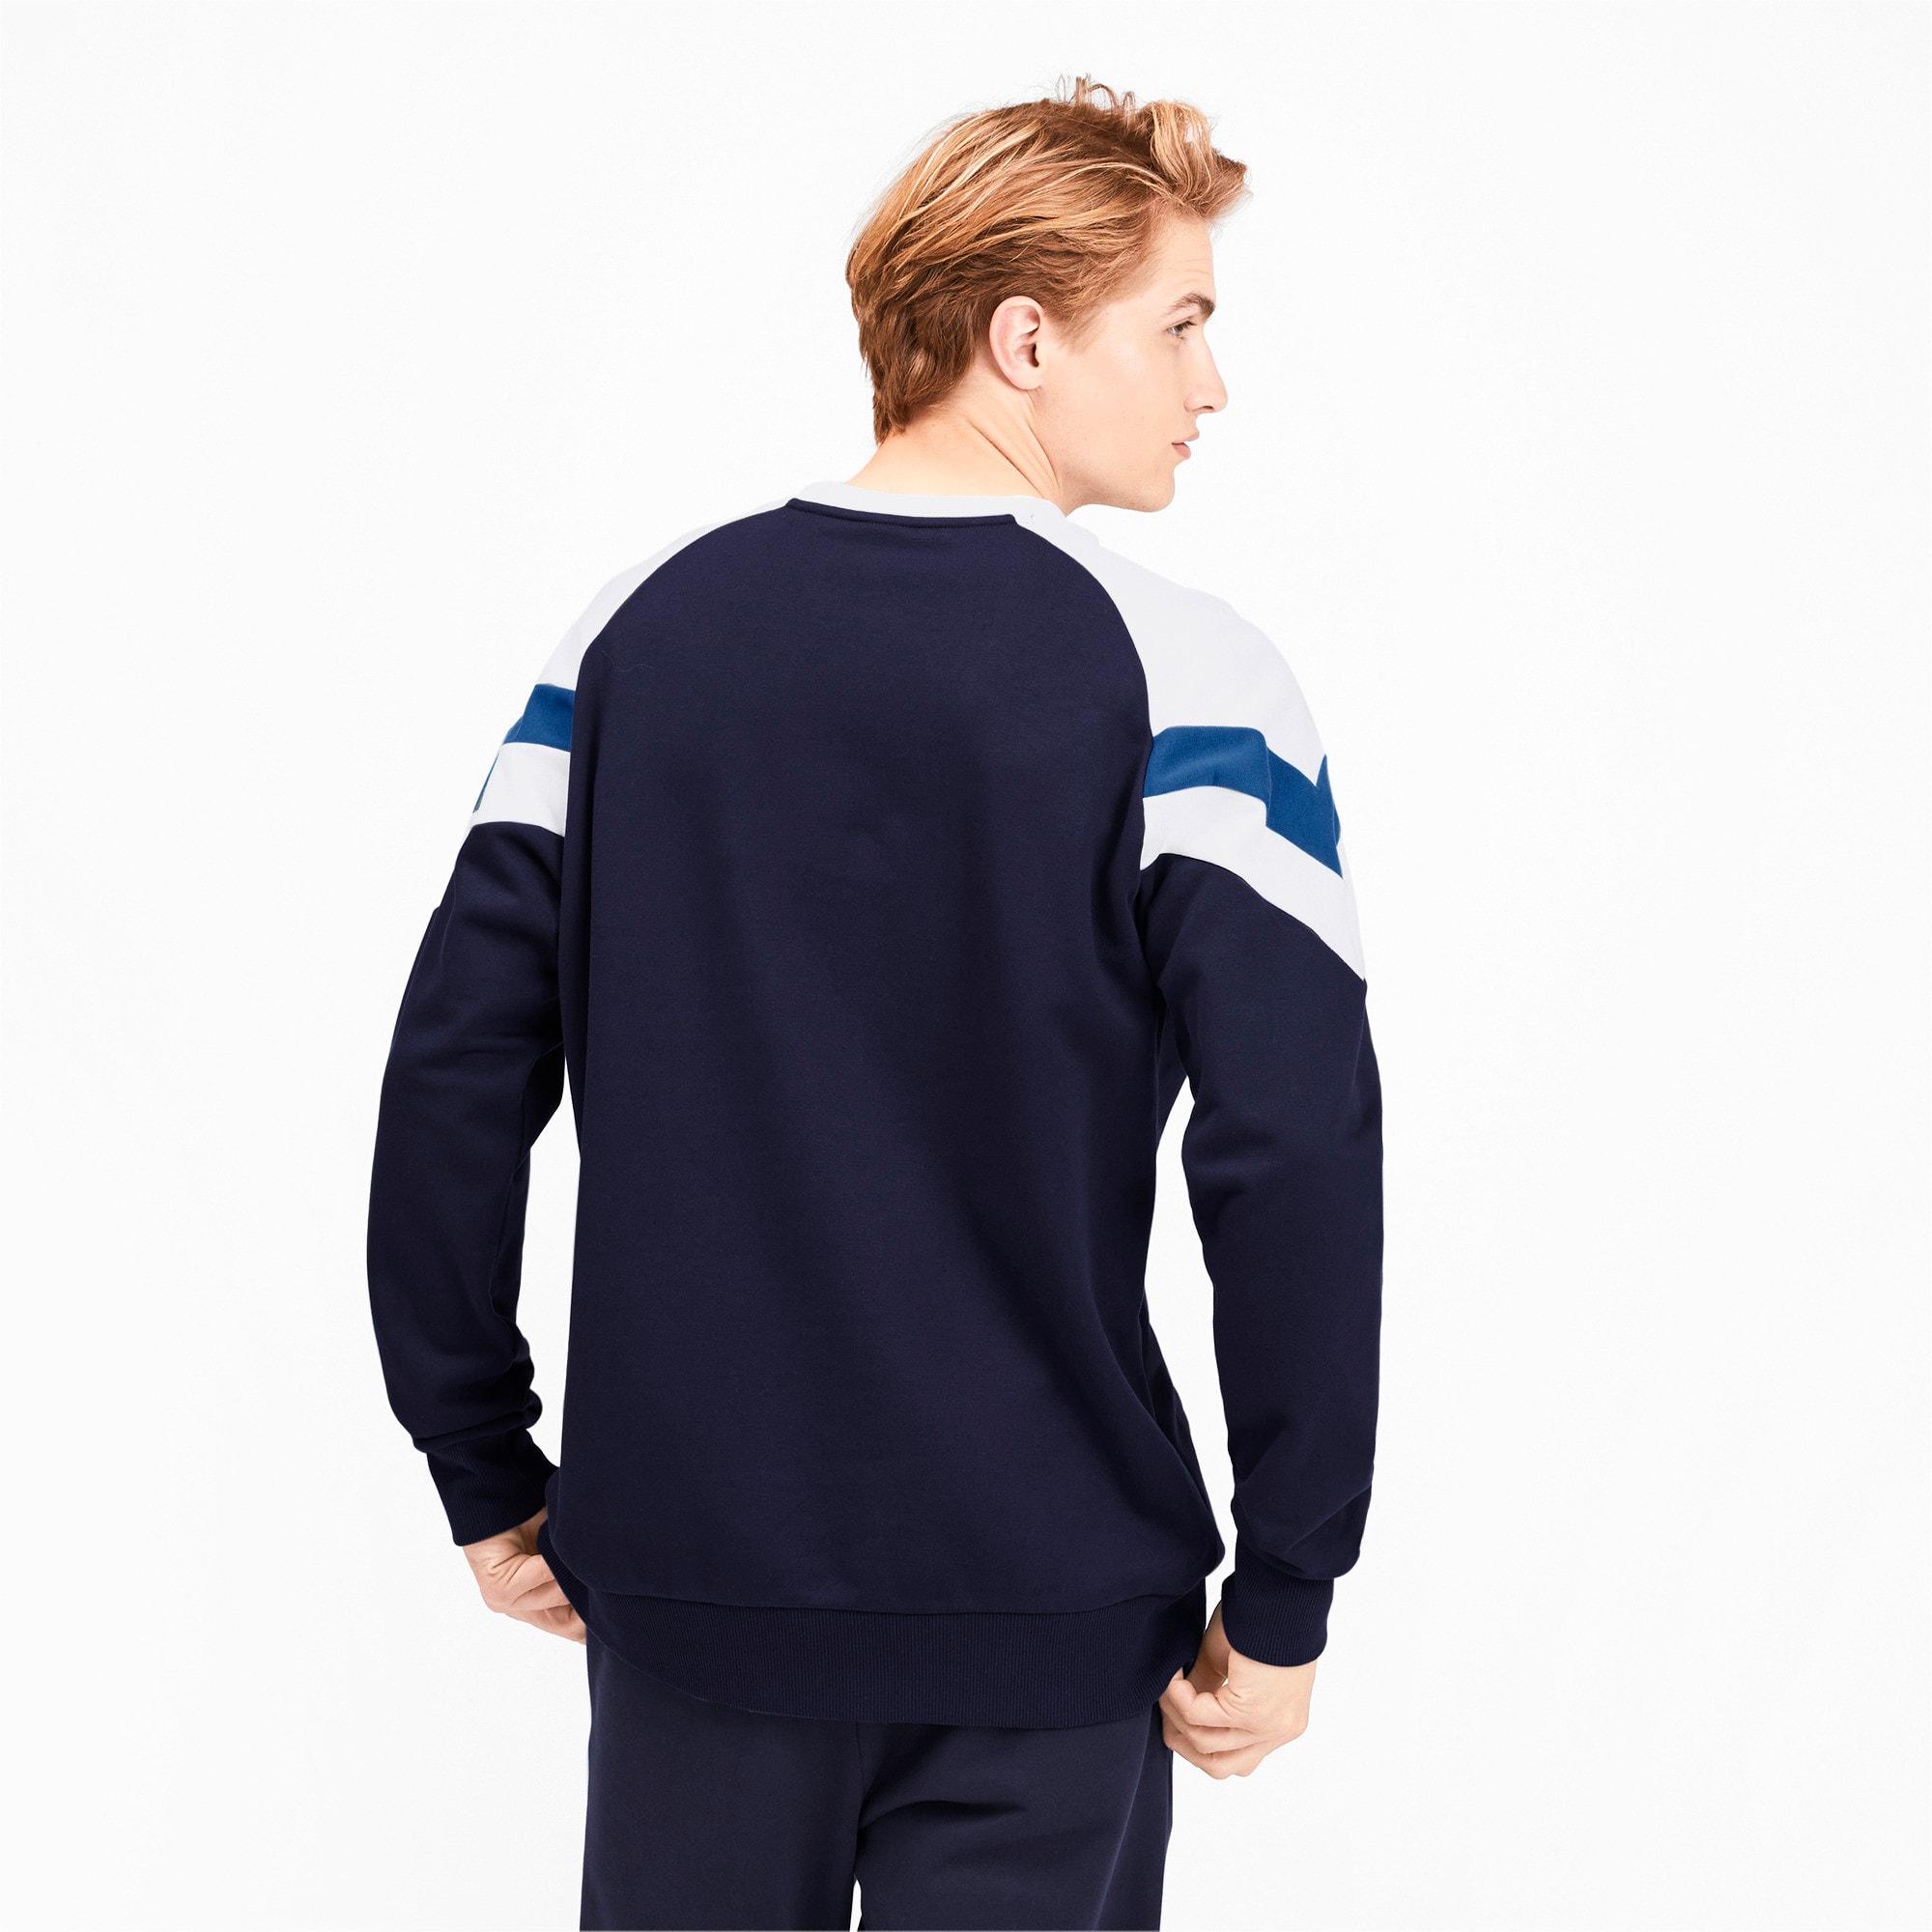 Thumbnail 3 of Iconic MCS Crew Men's Sweater, Peacoat, medium